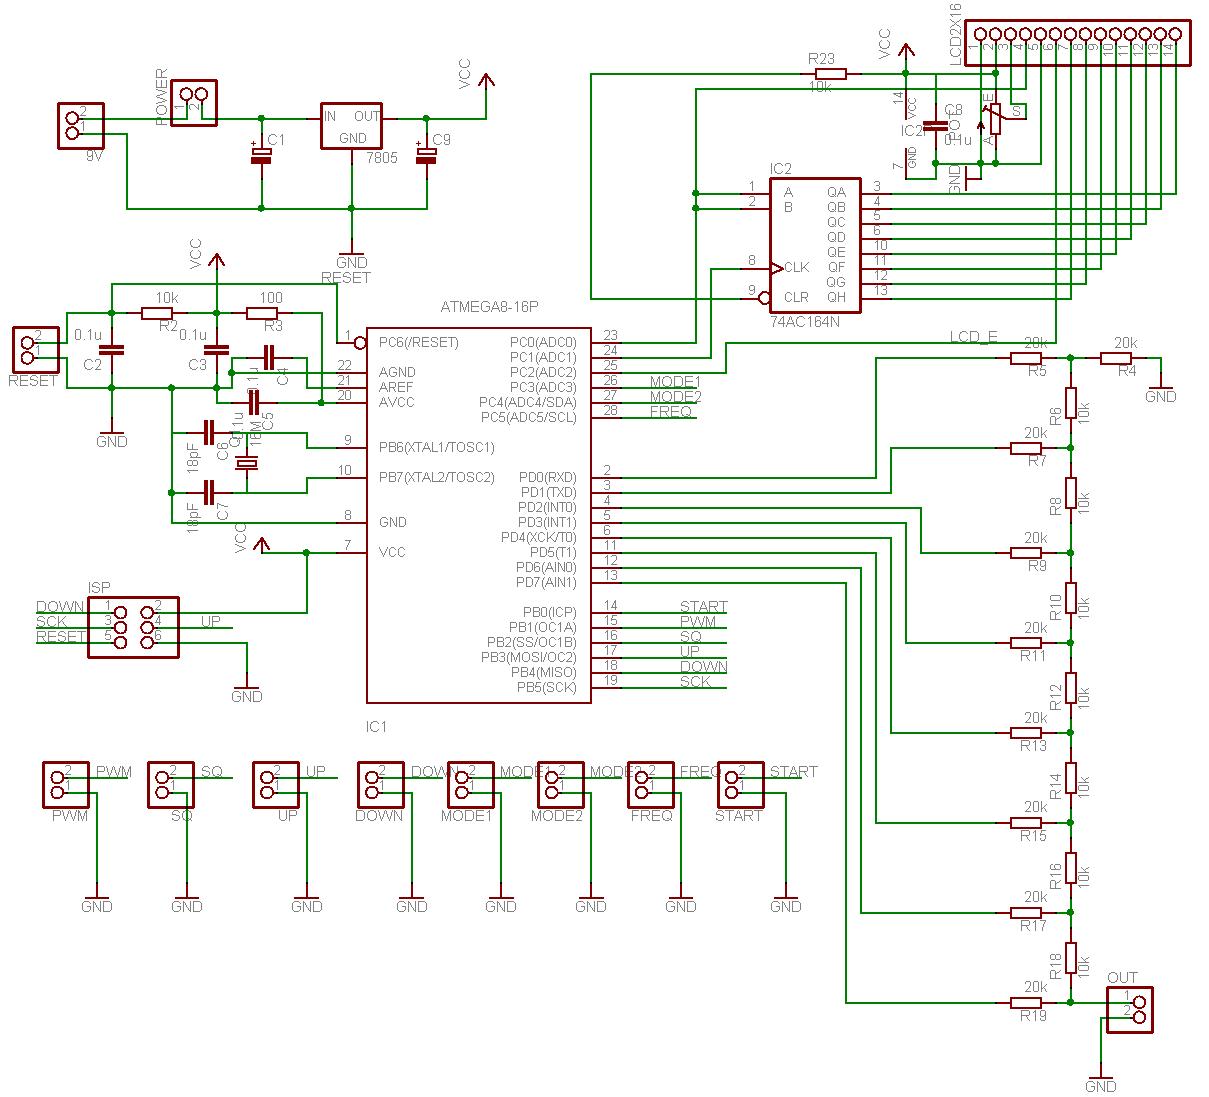 AVR controlled signal generator schematic